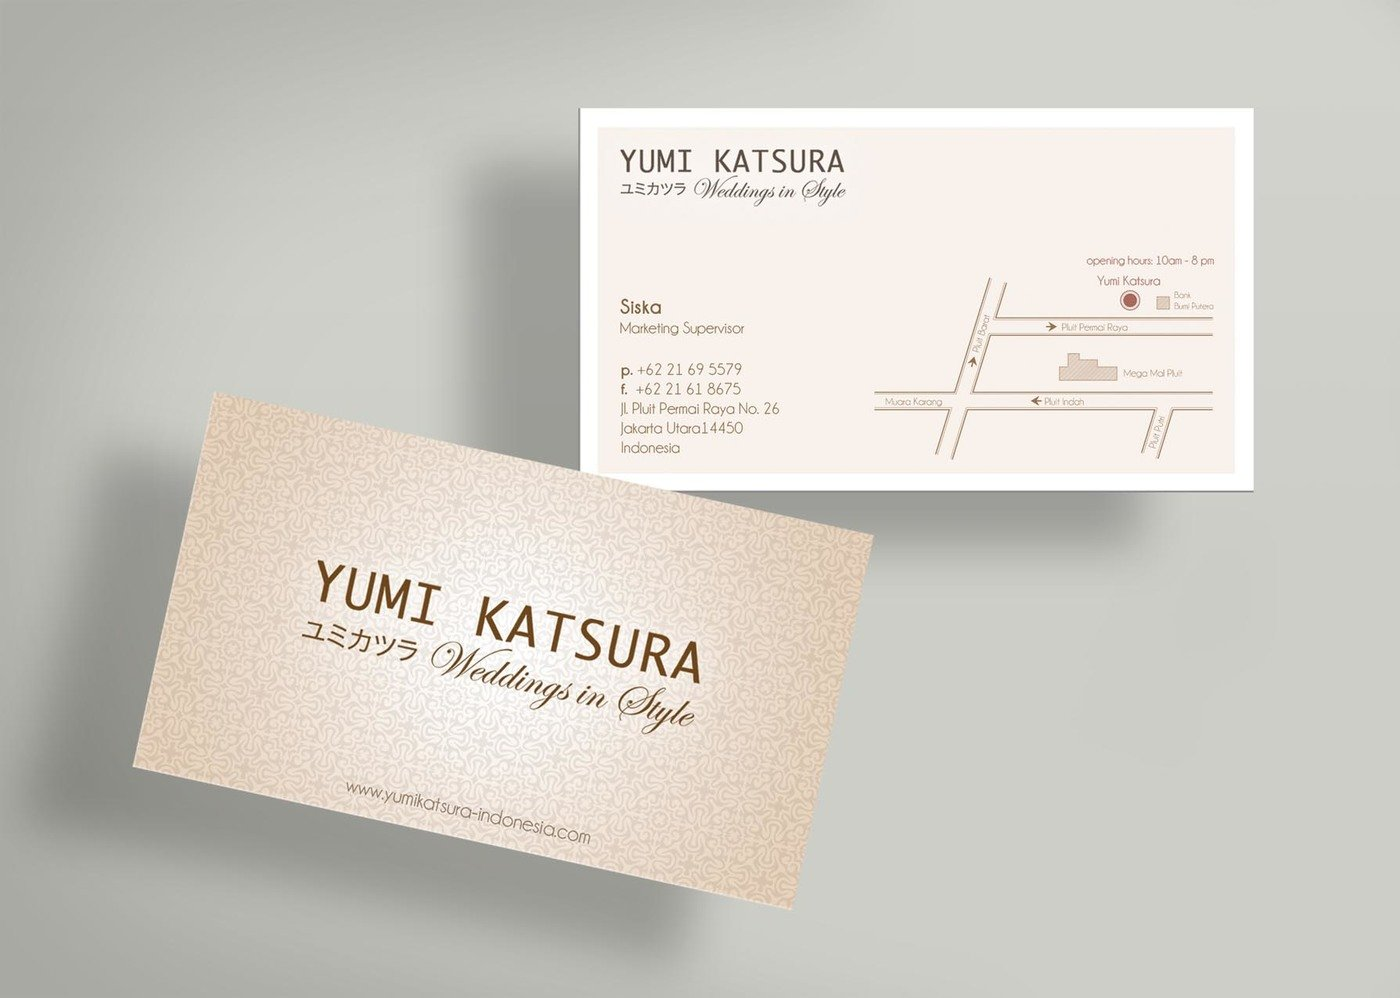 Finest Yumi Katsura - Business Card & Price Tag Design by Sherly Gunawan  OD84